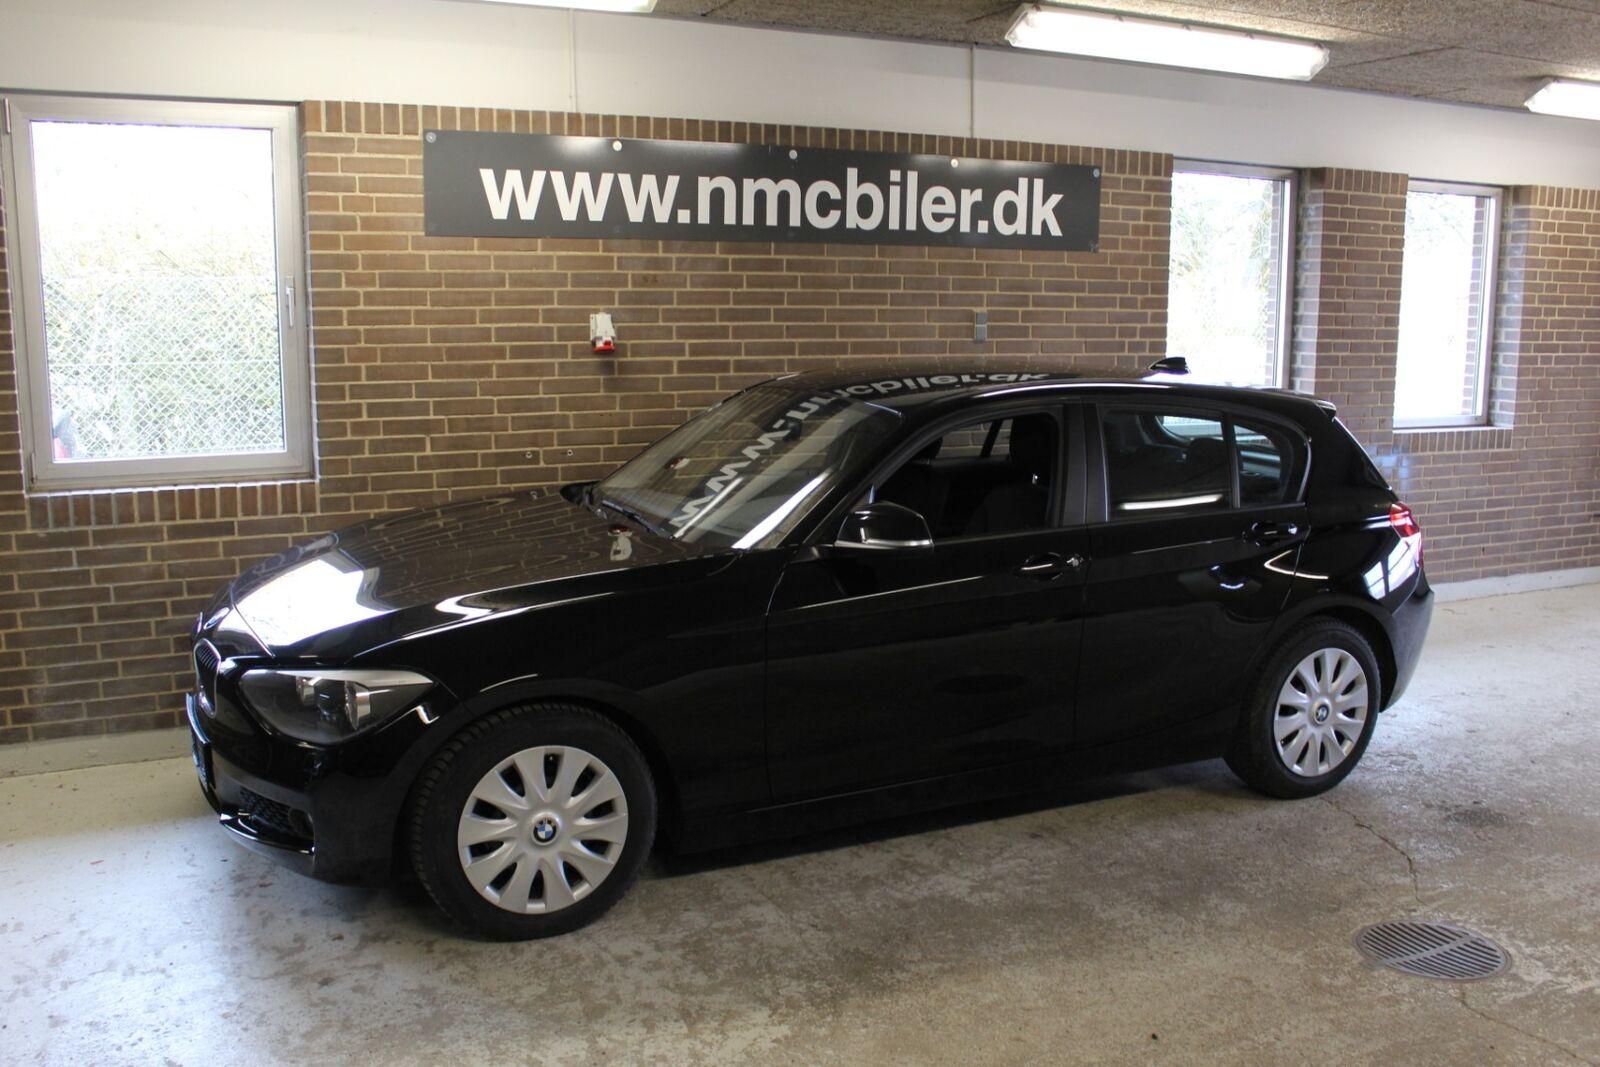 BMW 116d 1,6 ED 5d - 134.800 kr.